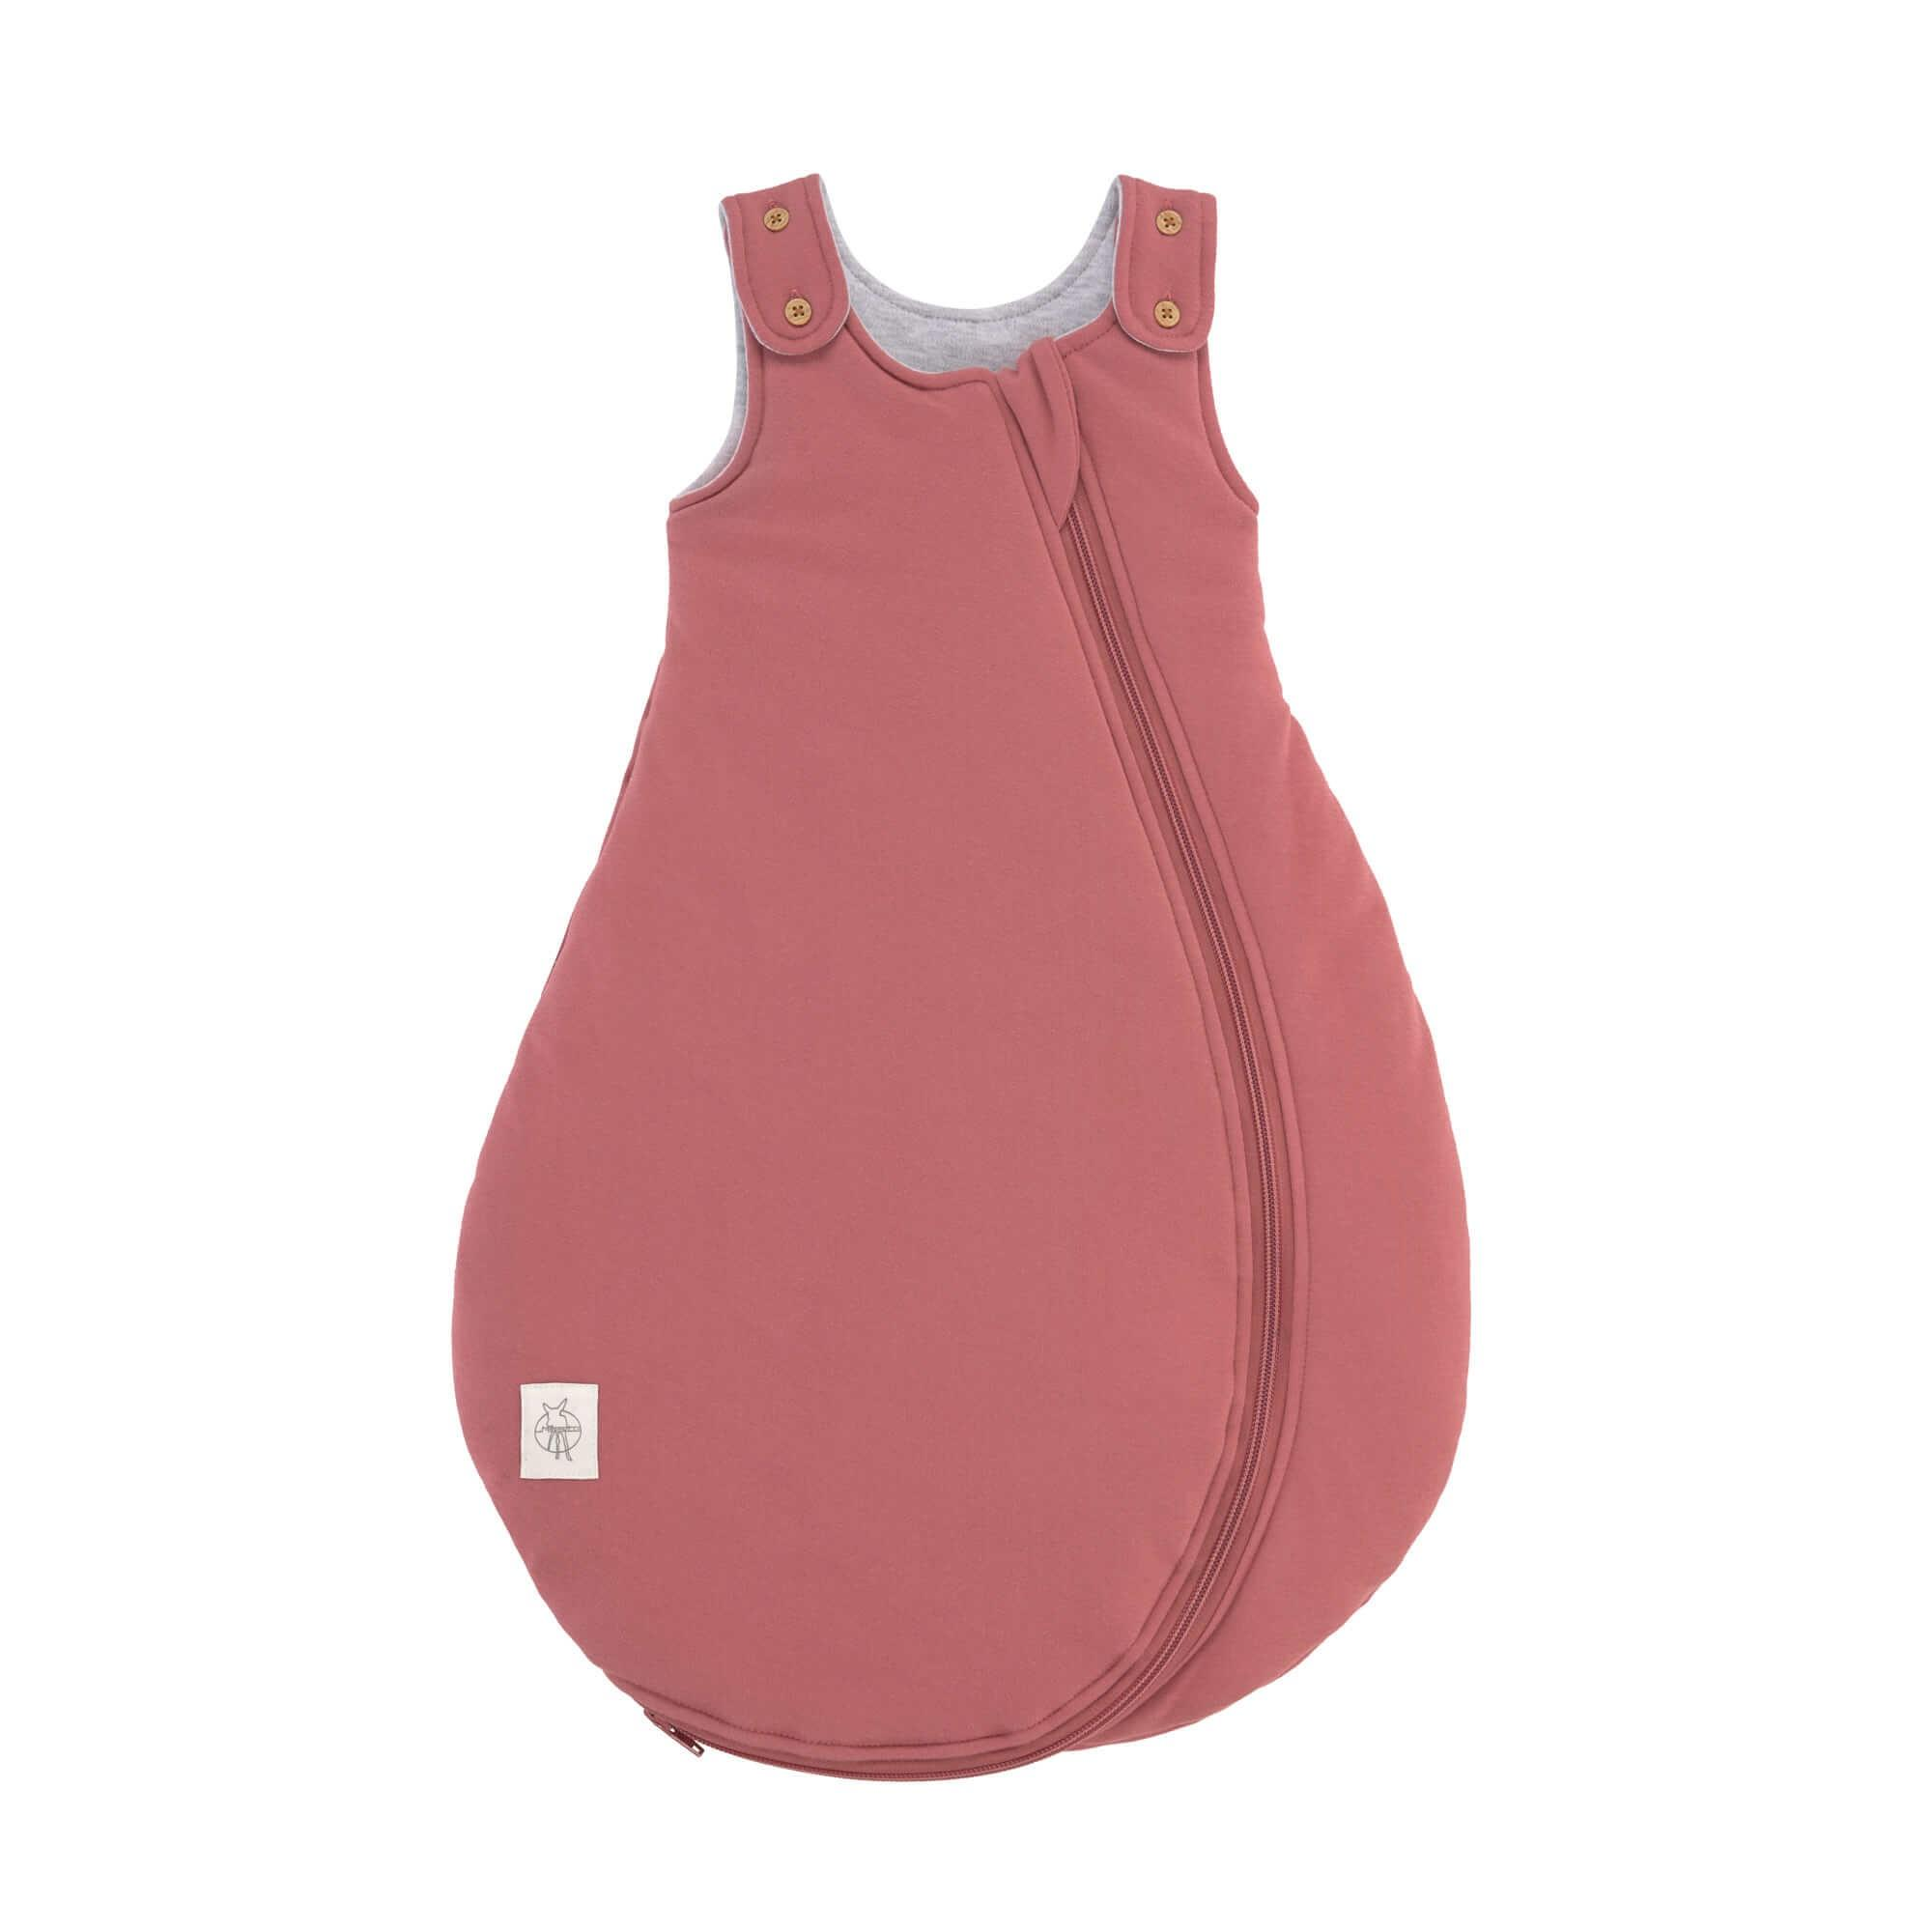 Lassig - Baby Sleeping Bag rosewood, 74/80 7-12M, all season edition